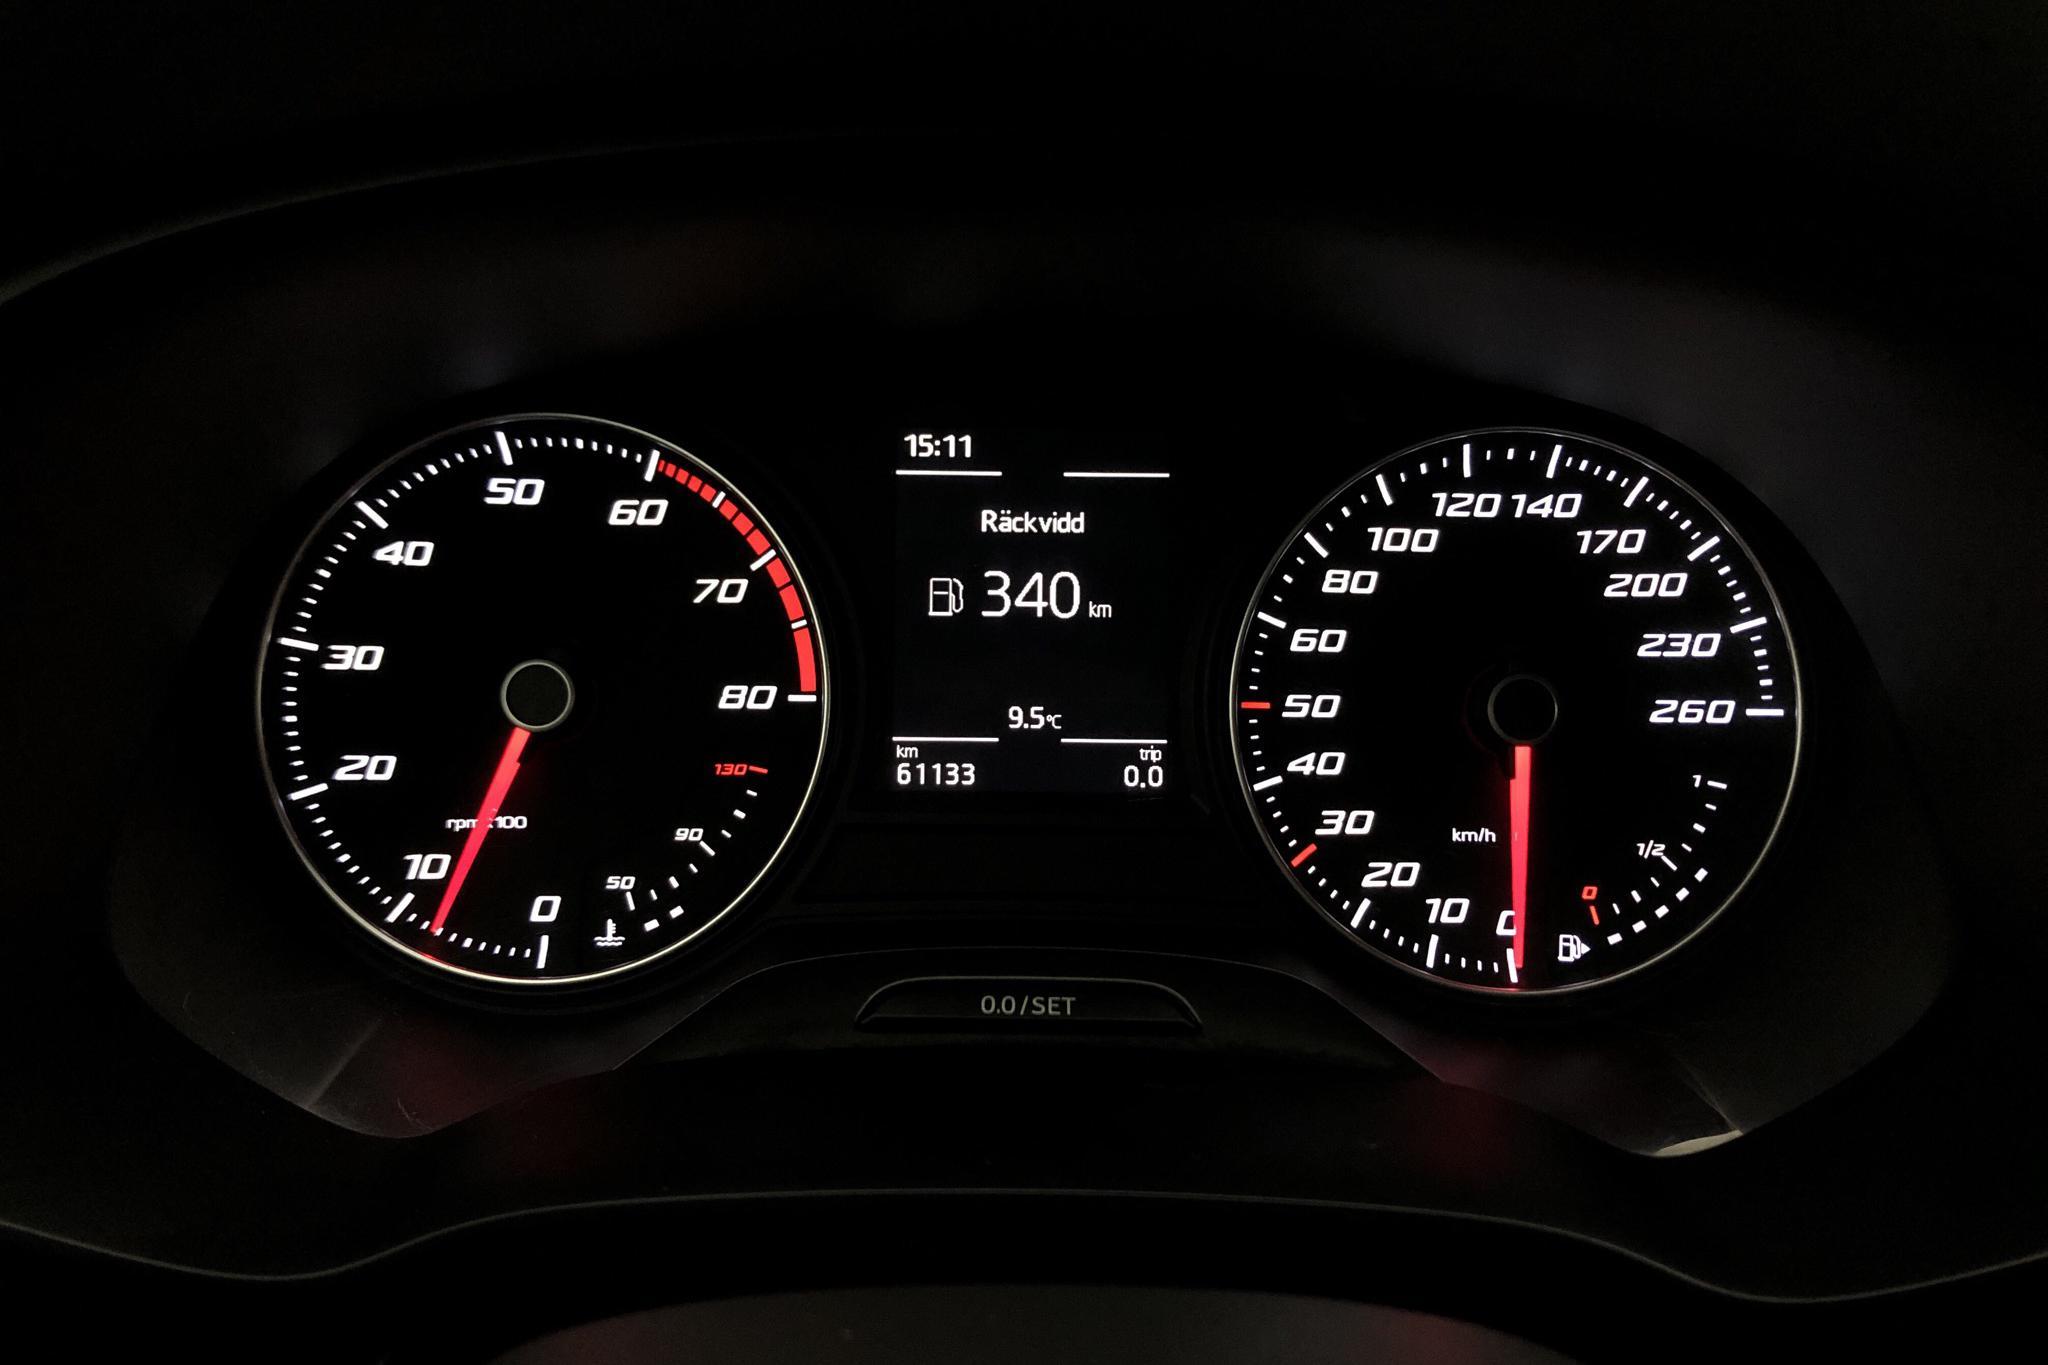 Seat Leon 1.2 TSI 5dr (110hk) - 61 130 km - Manual - Dark Grey - 2016